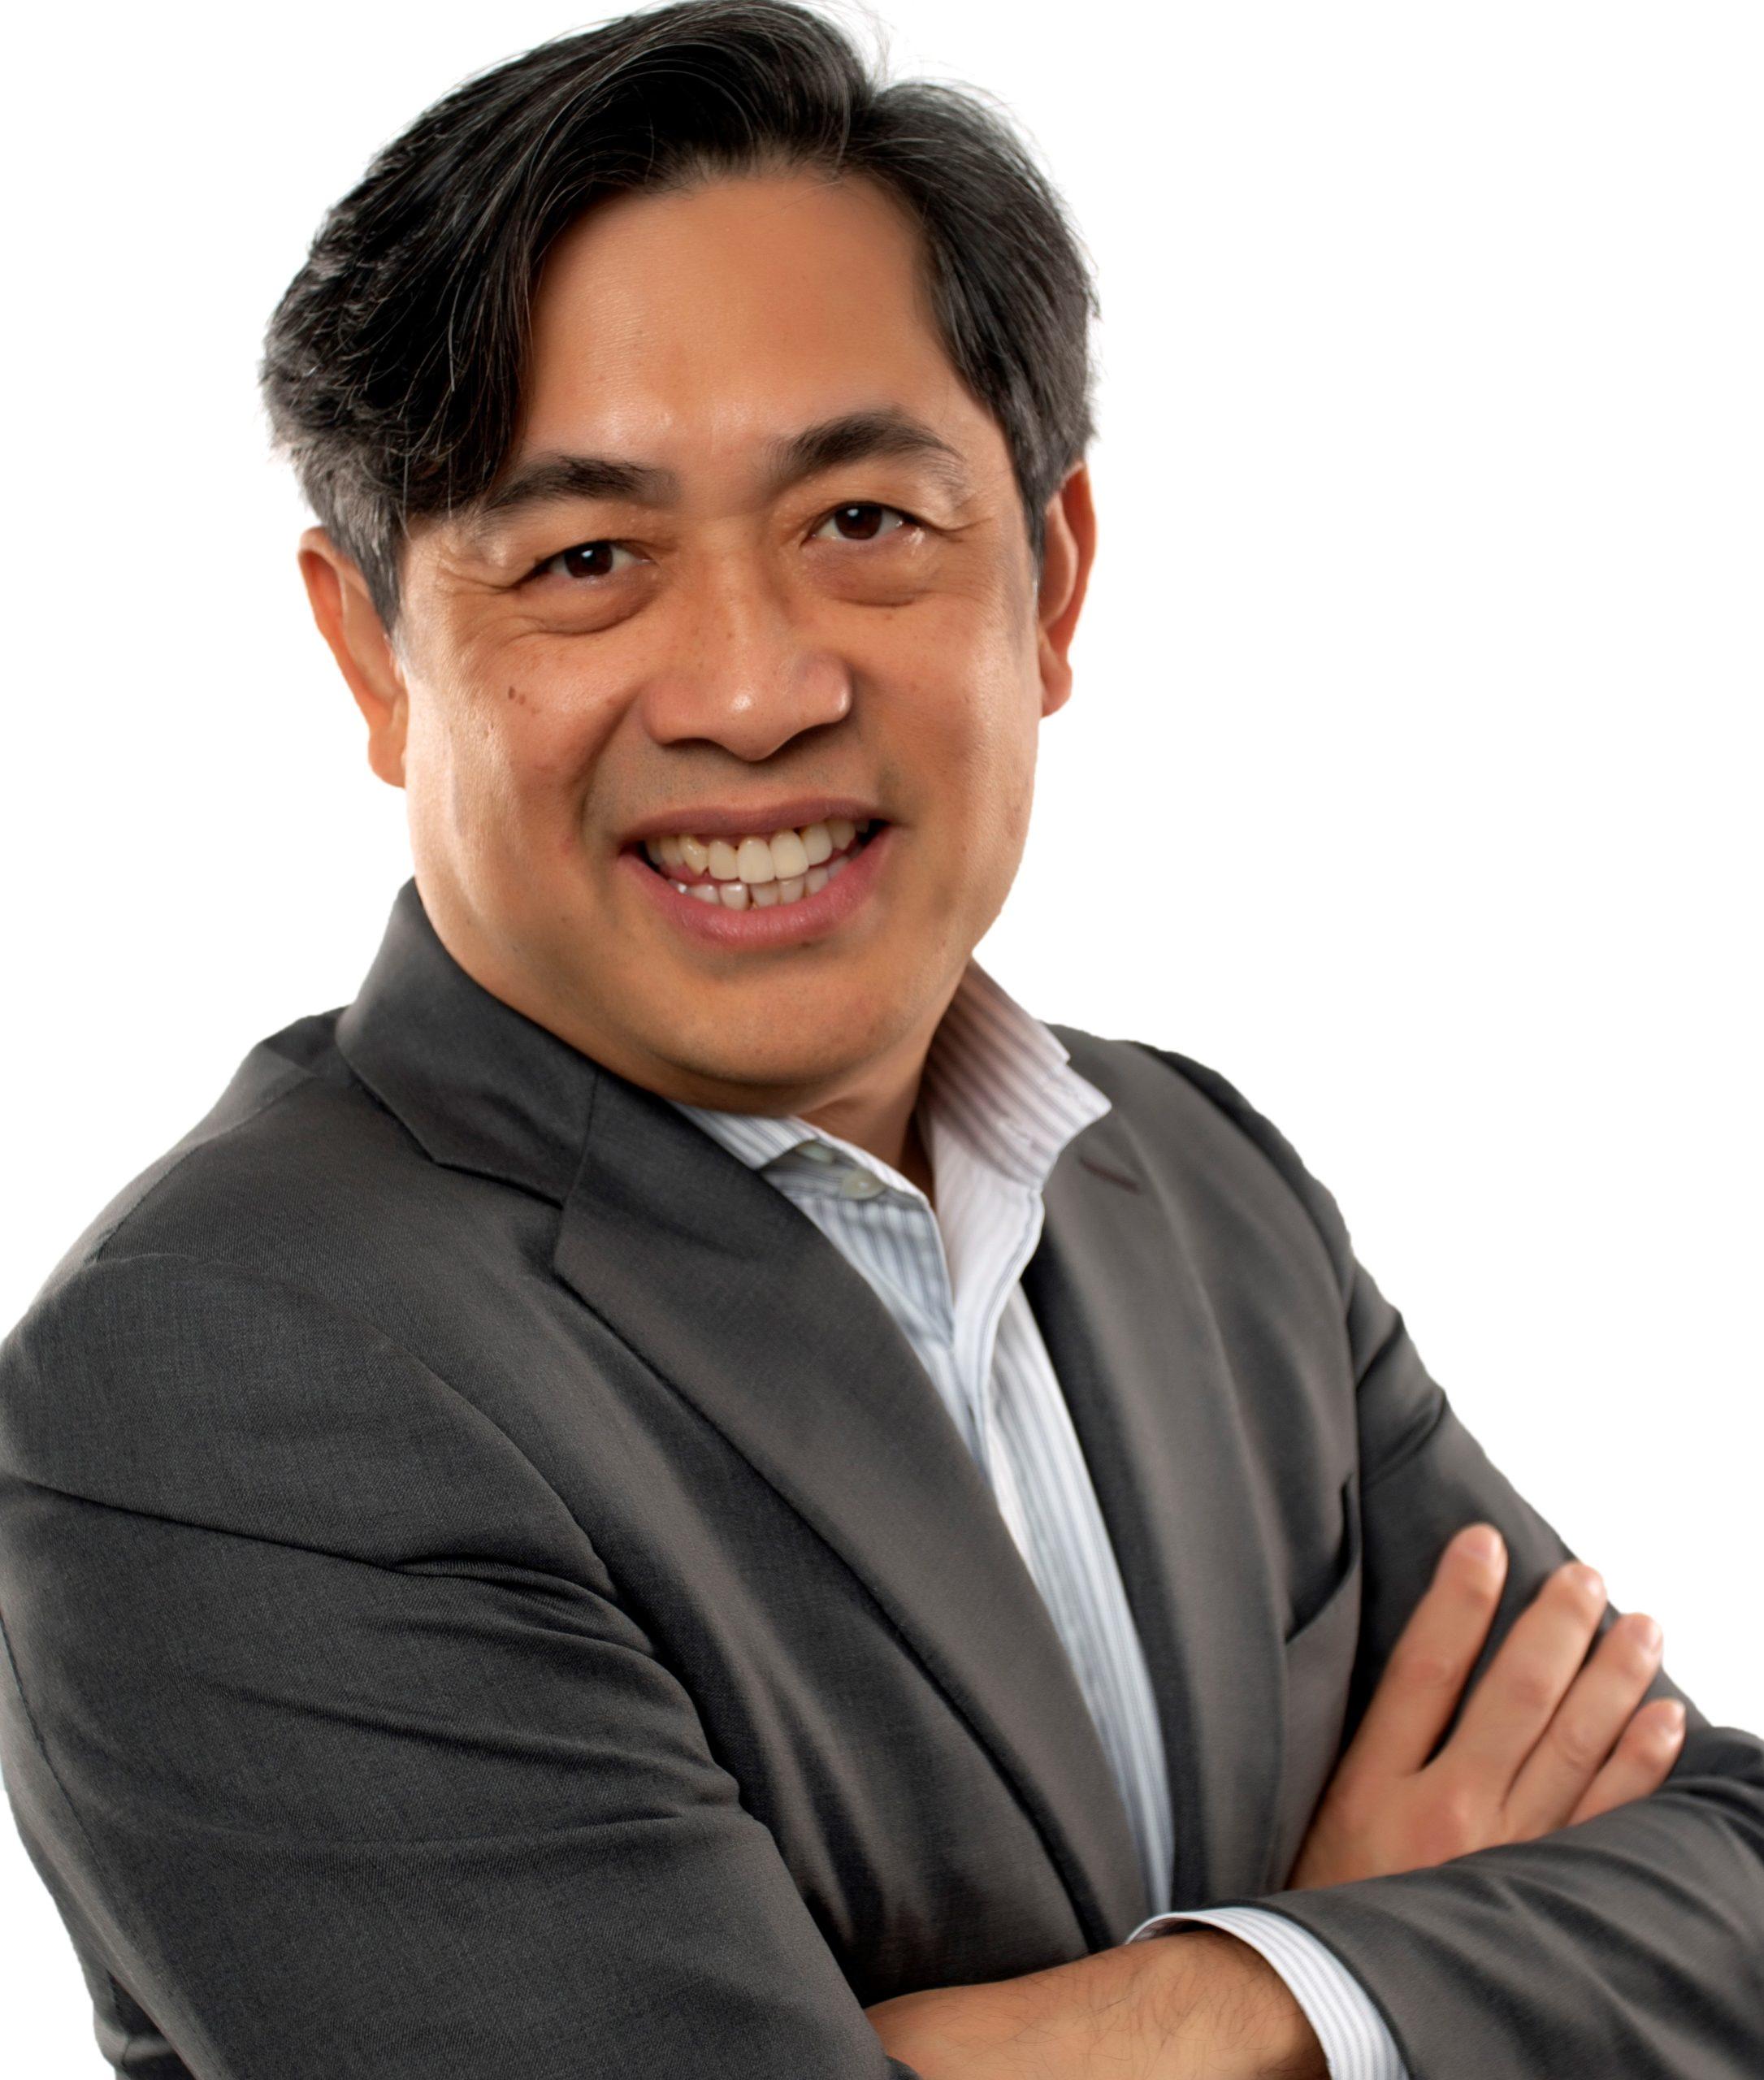 Tri Pham, Chief Strategy Officer, Tata Communications